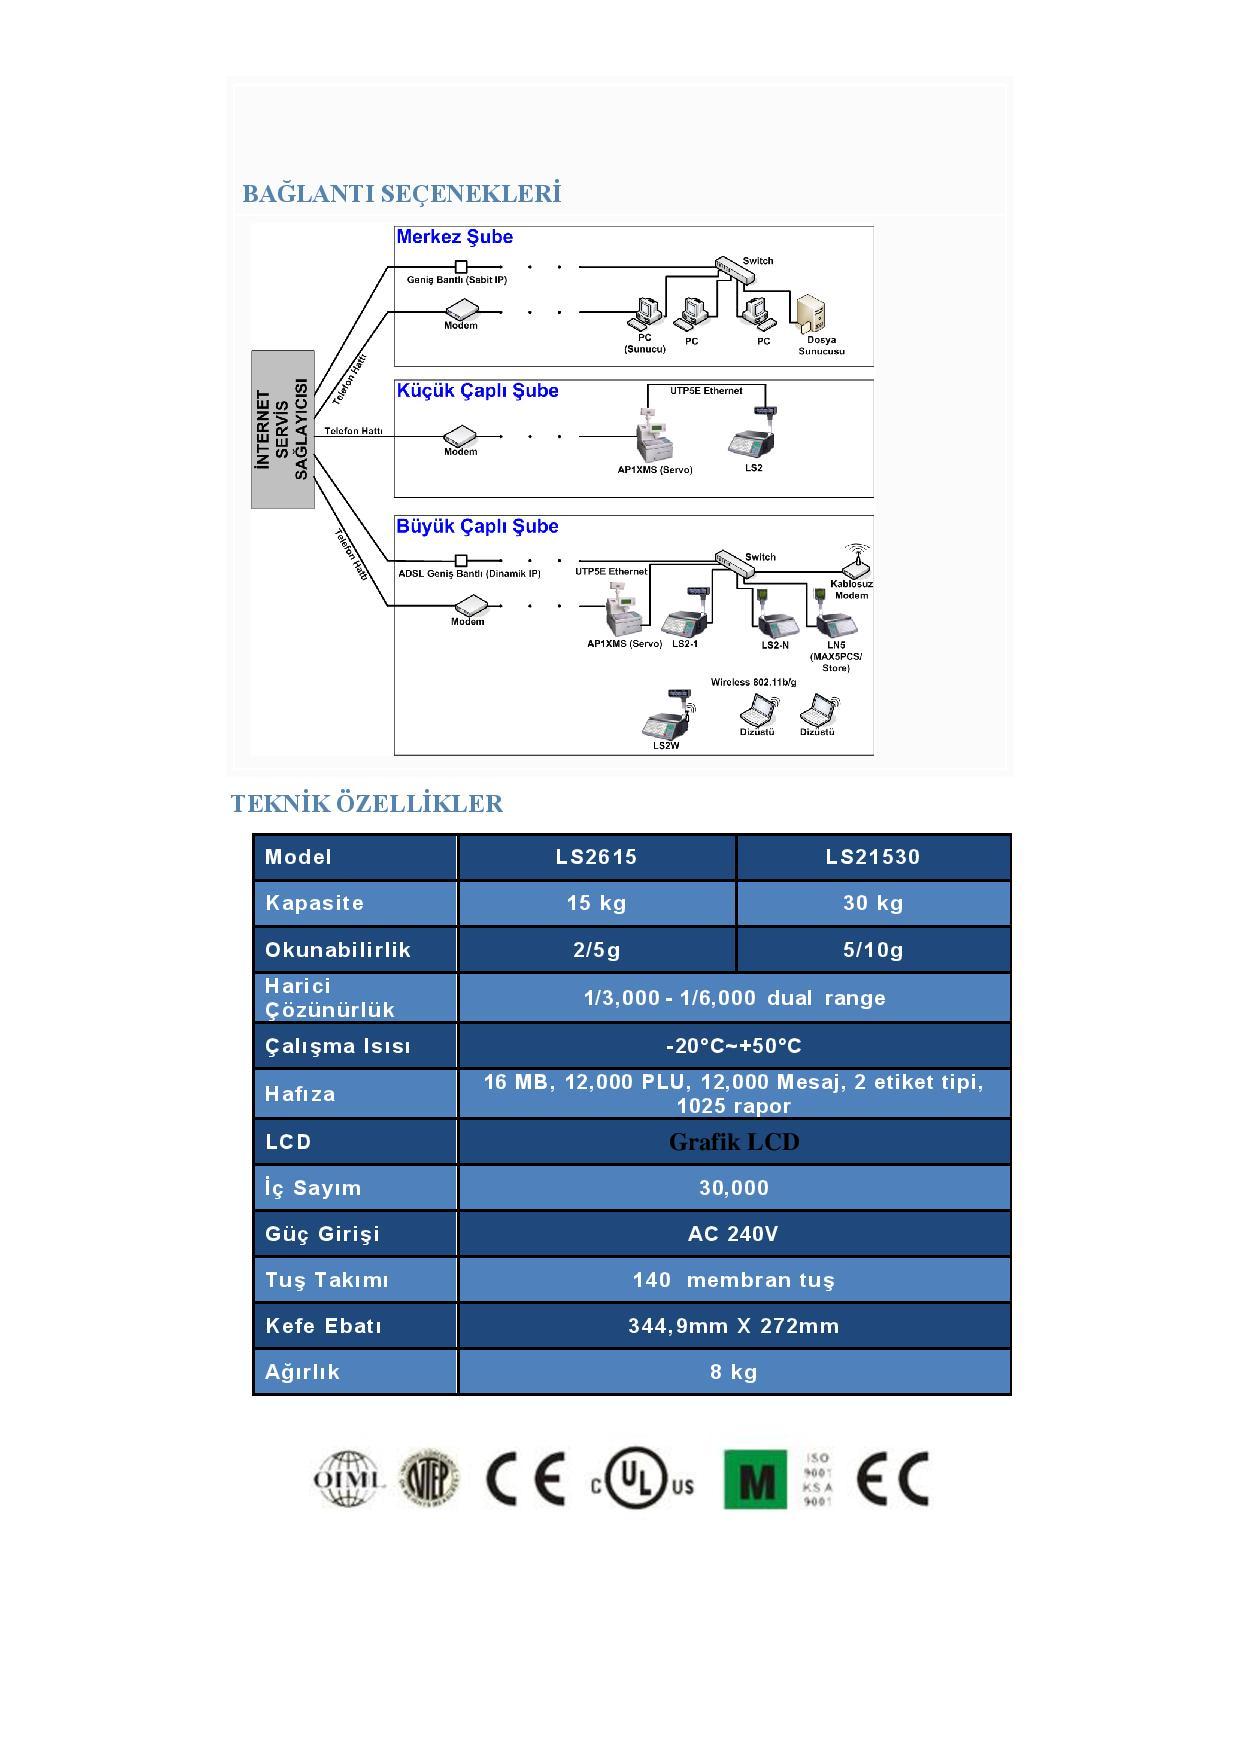 https://webdenal.s3.amazonaws.com/catalog2/140416-page-004.jpg